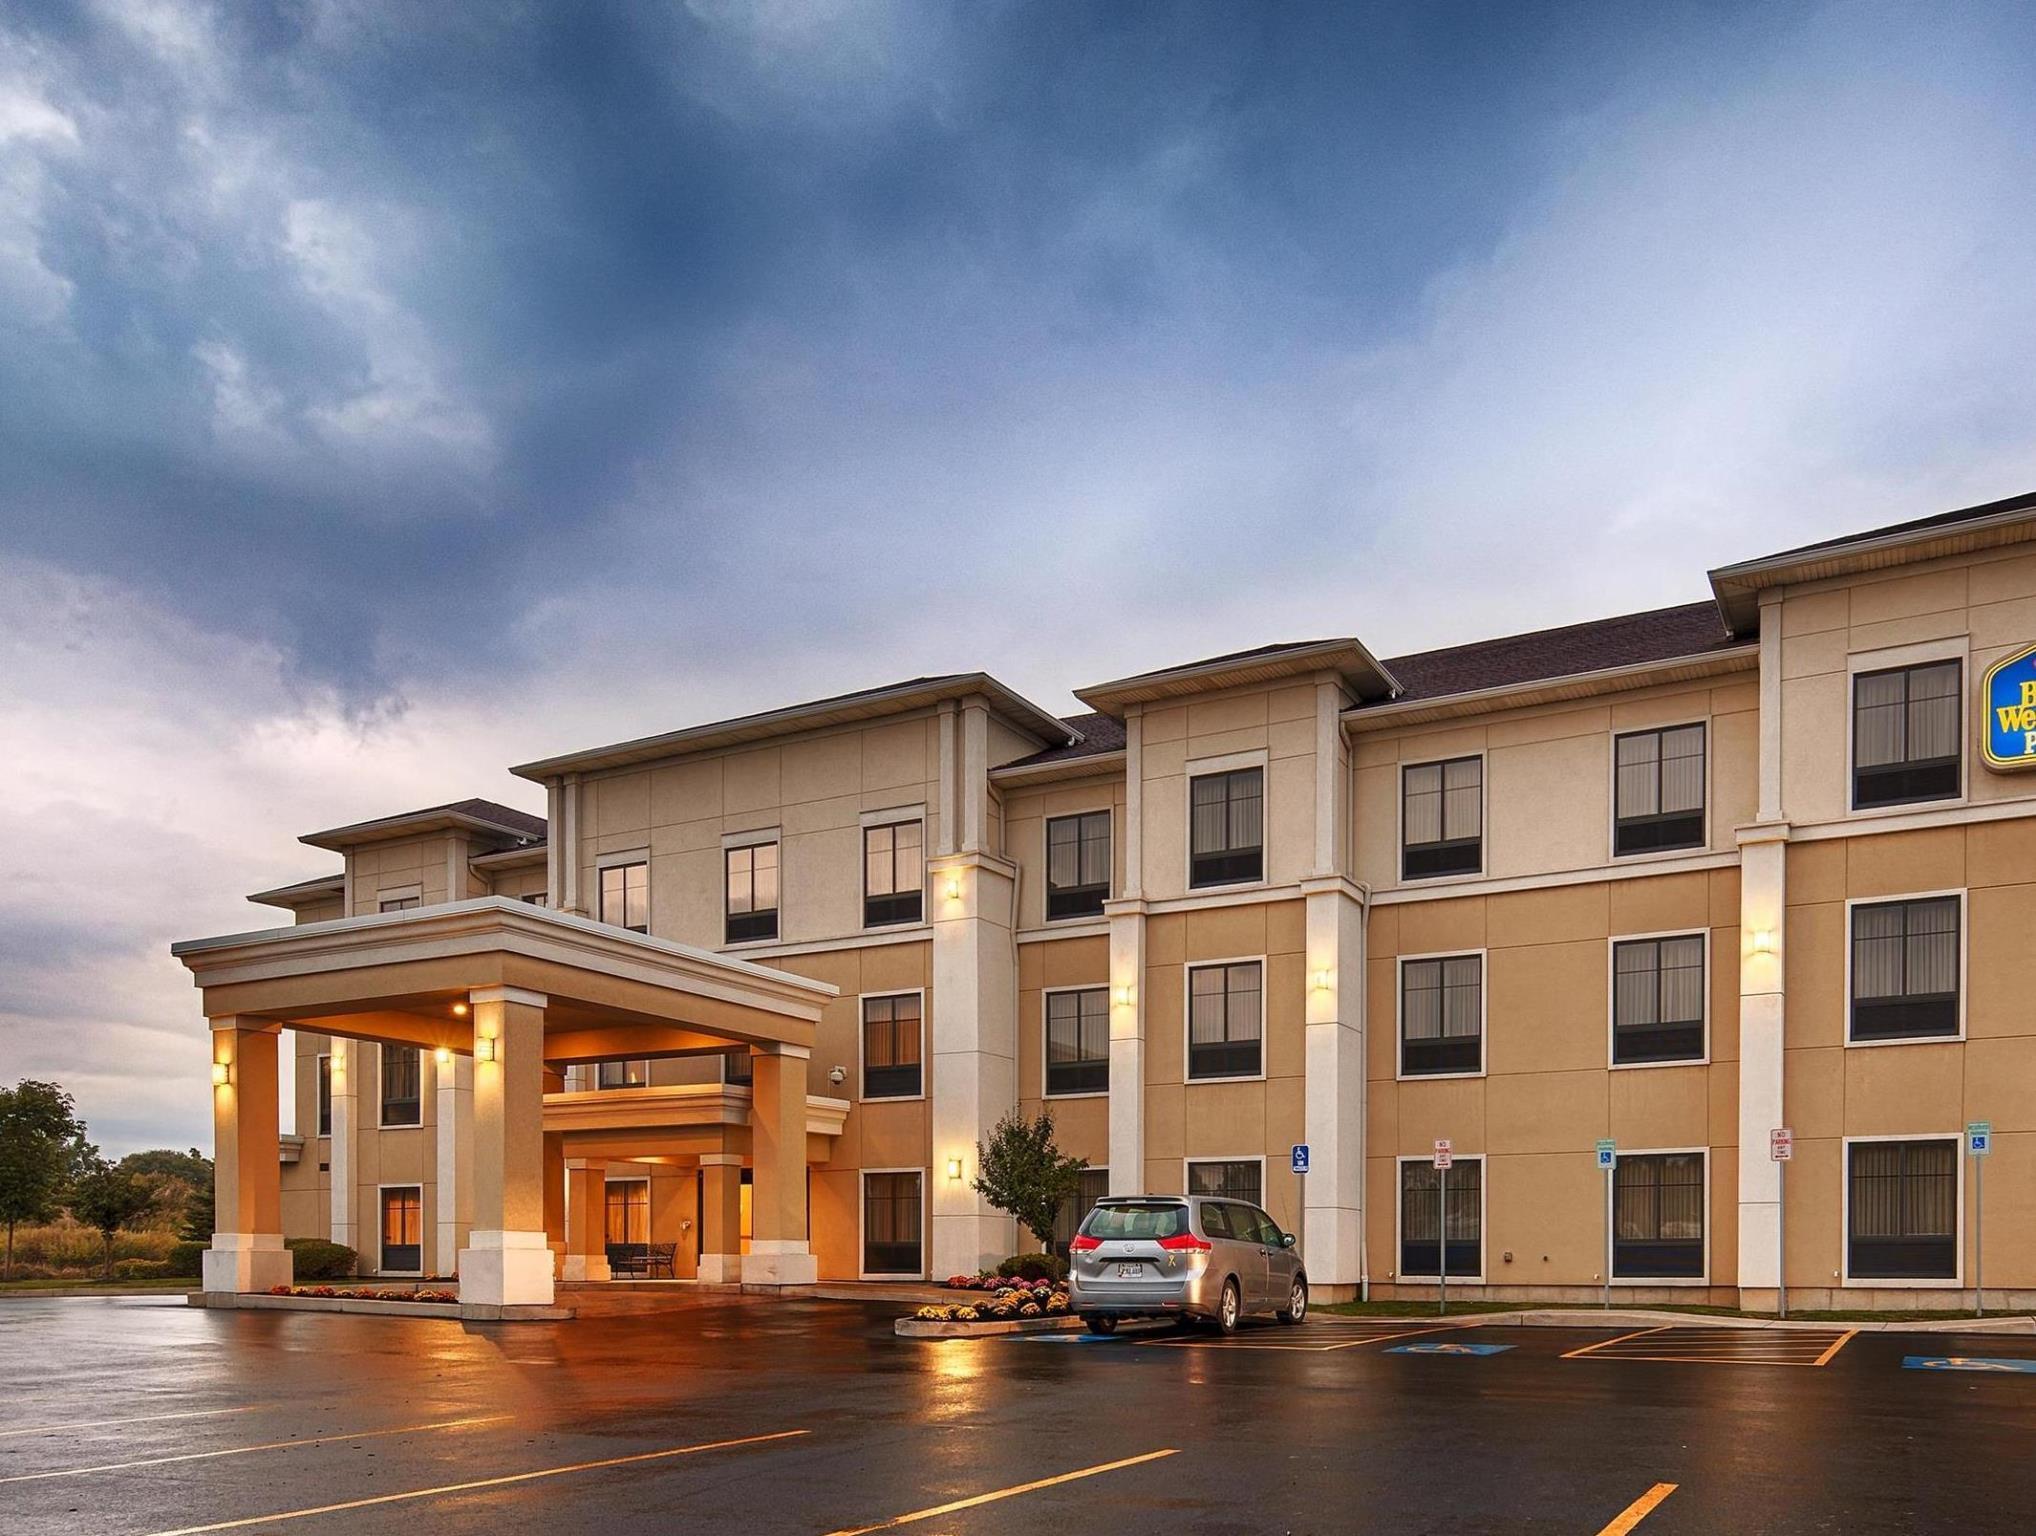 La Quinta Inn & Suites by Wyndham Lackawanna, Erie